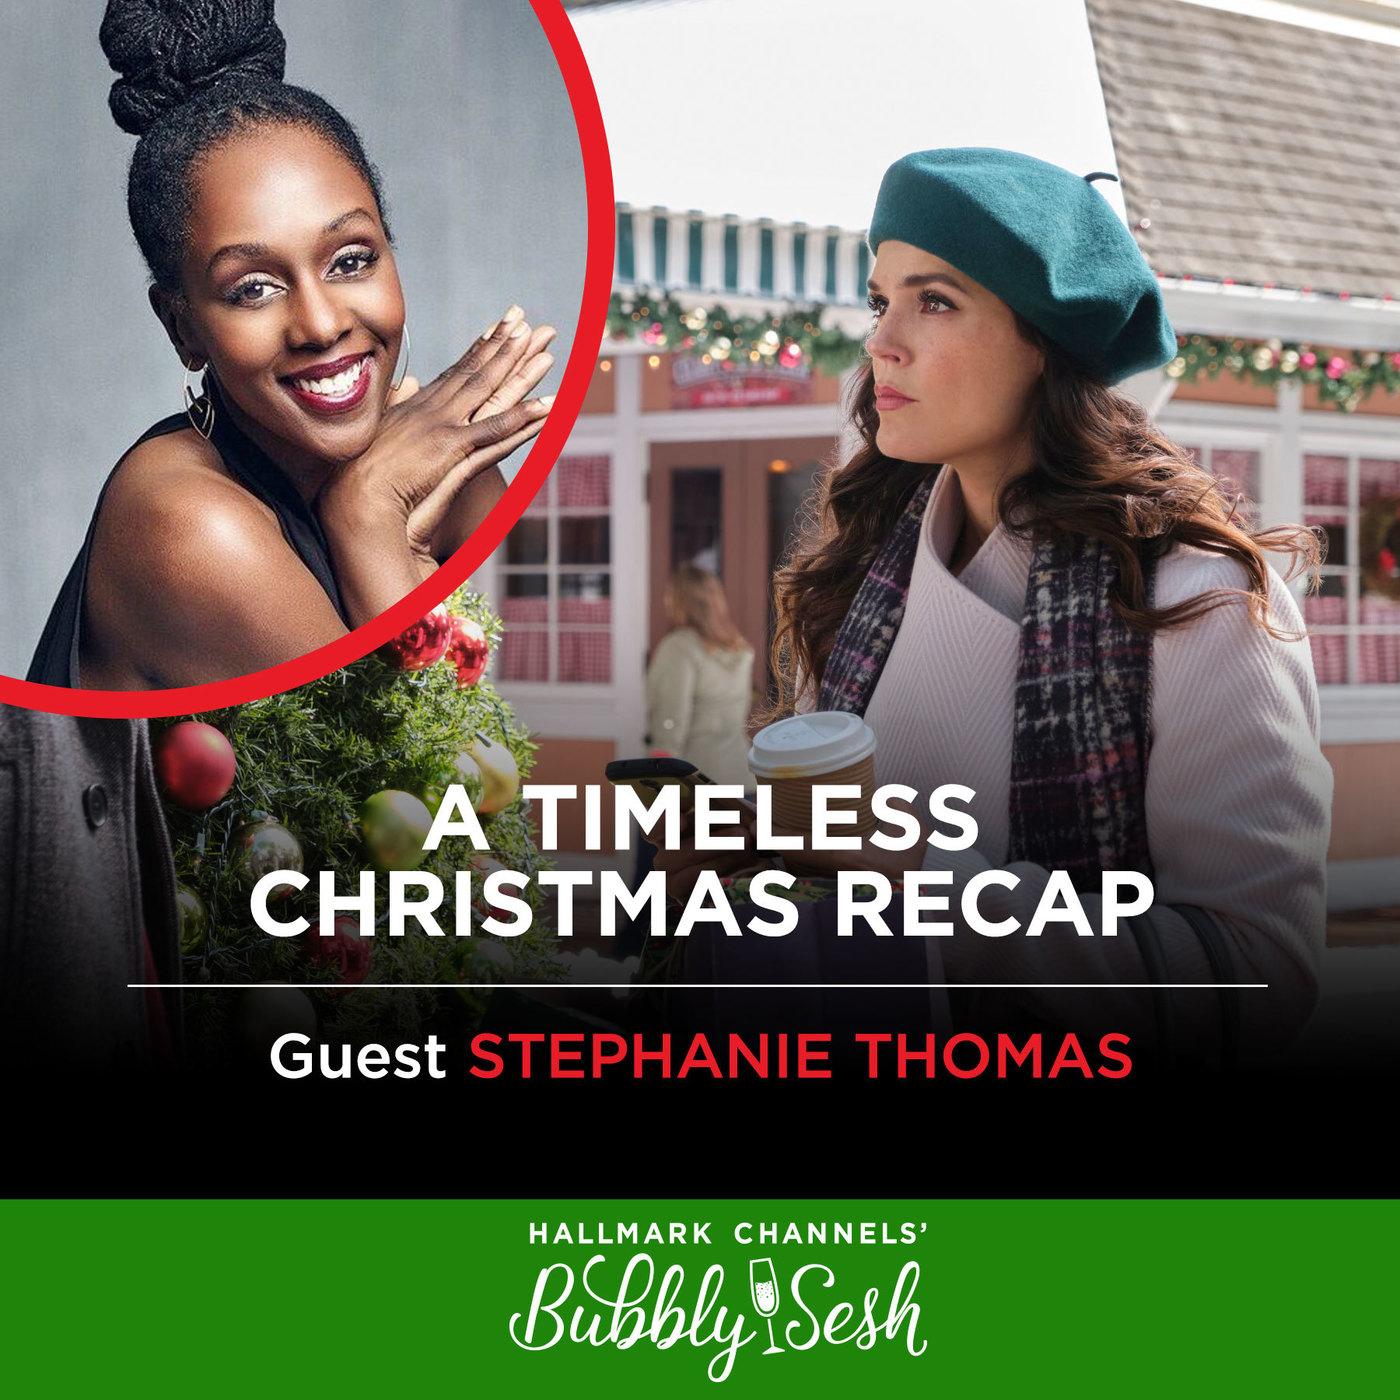 A Timeless Christmas Recap with Guest Stephanie Thomas